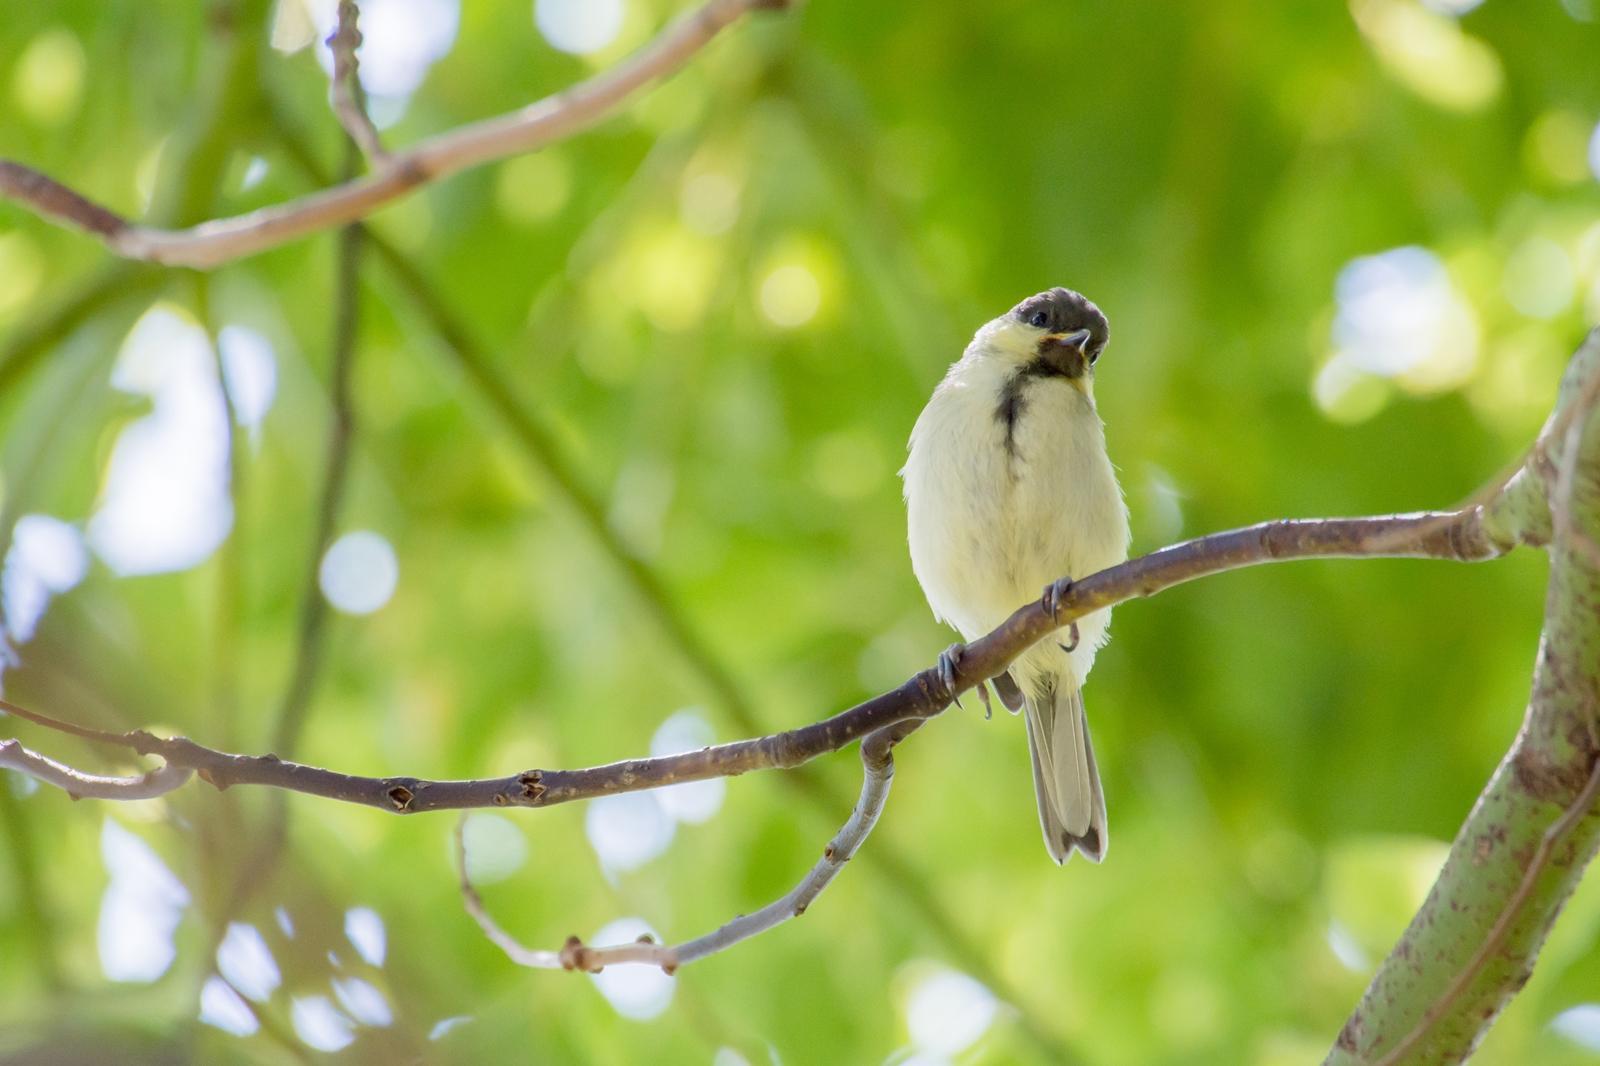 Photo: なんだろう? Whats that?  飛び出した世界 少しずつ芽生える好奇心 きょろきょろ観察 なんだろう 不思議がいっぱい  Juvenile of Japanese Tit. (シジュウカラの幼鳥)  #birdphotography #birds #cooljapan #kawaii #nikon #sigma Nikon D7200 SIGMA APO 50-500mm F5-6.3 DG OS HSM (2枚追加:Added 2 photo)  ・小鳥の詩朗読 /poetry reading https://youtu.be/usQAfqethBQ?list=PL2YtHGm0-R3qVsaqvQe9OYdJFCkI98wzF